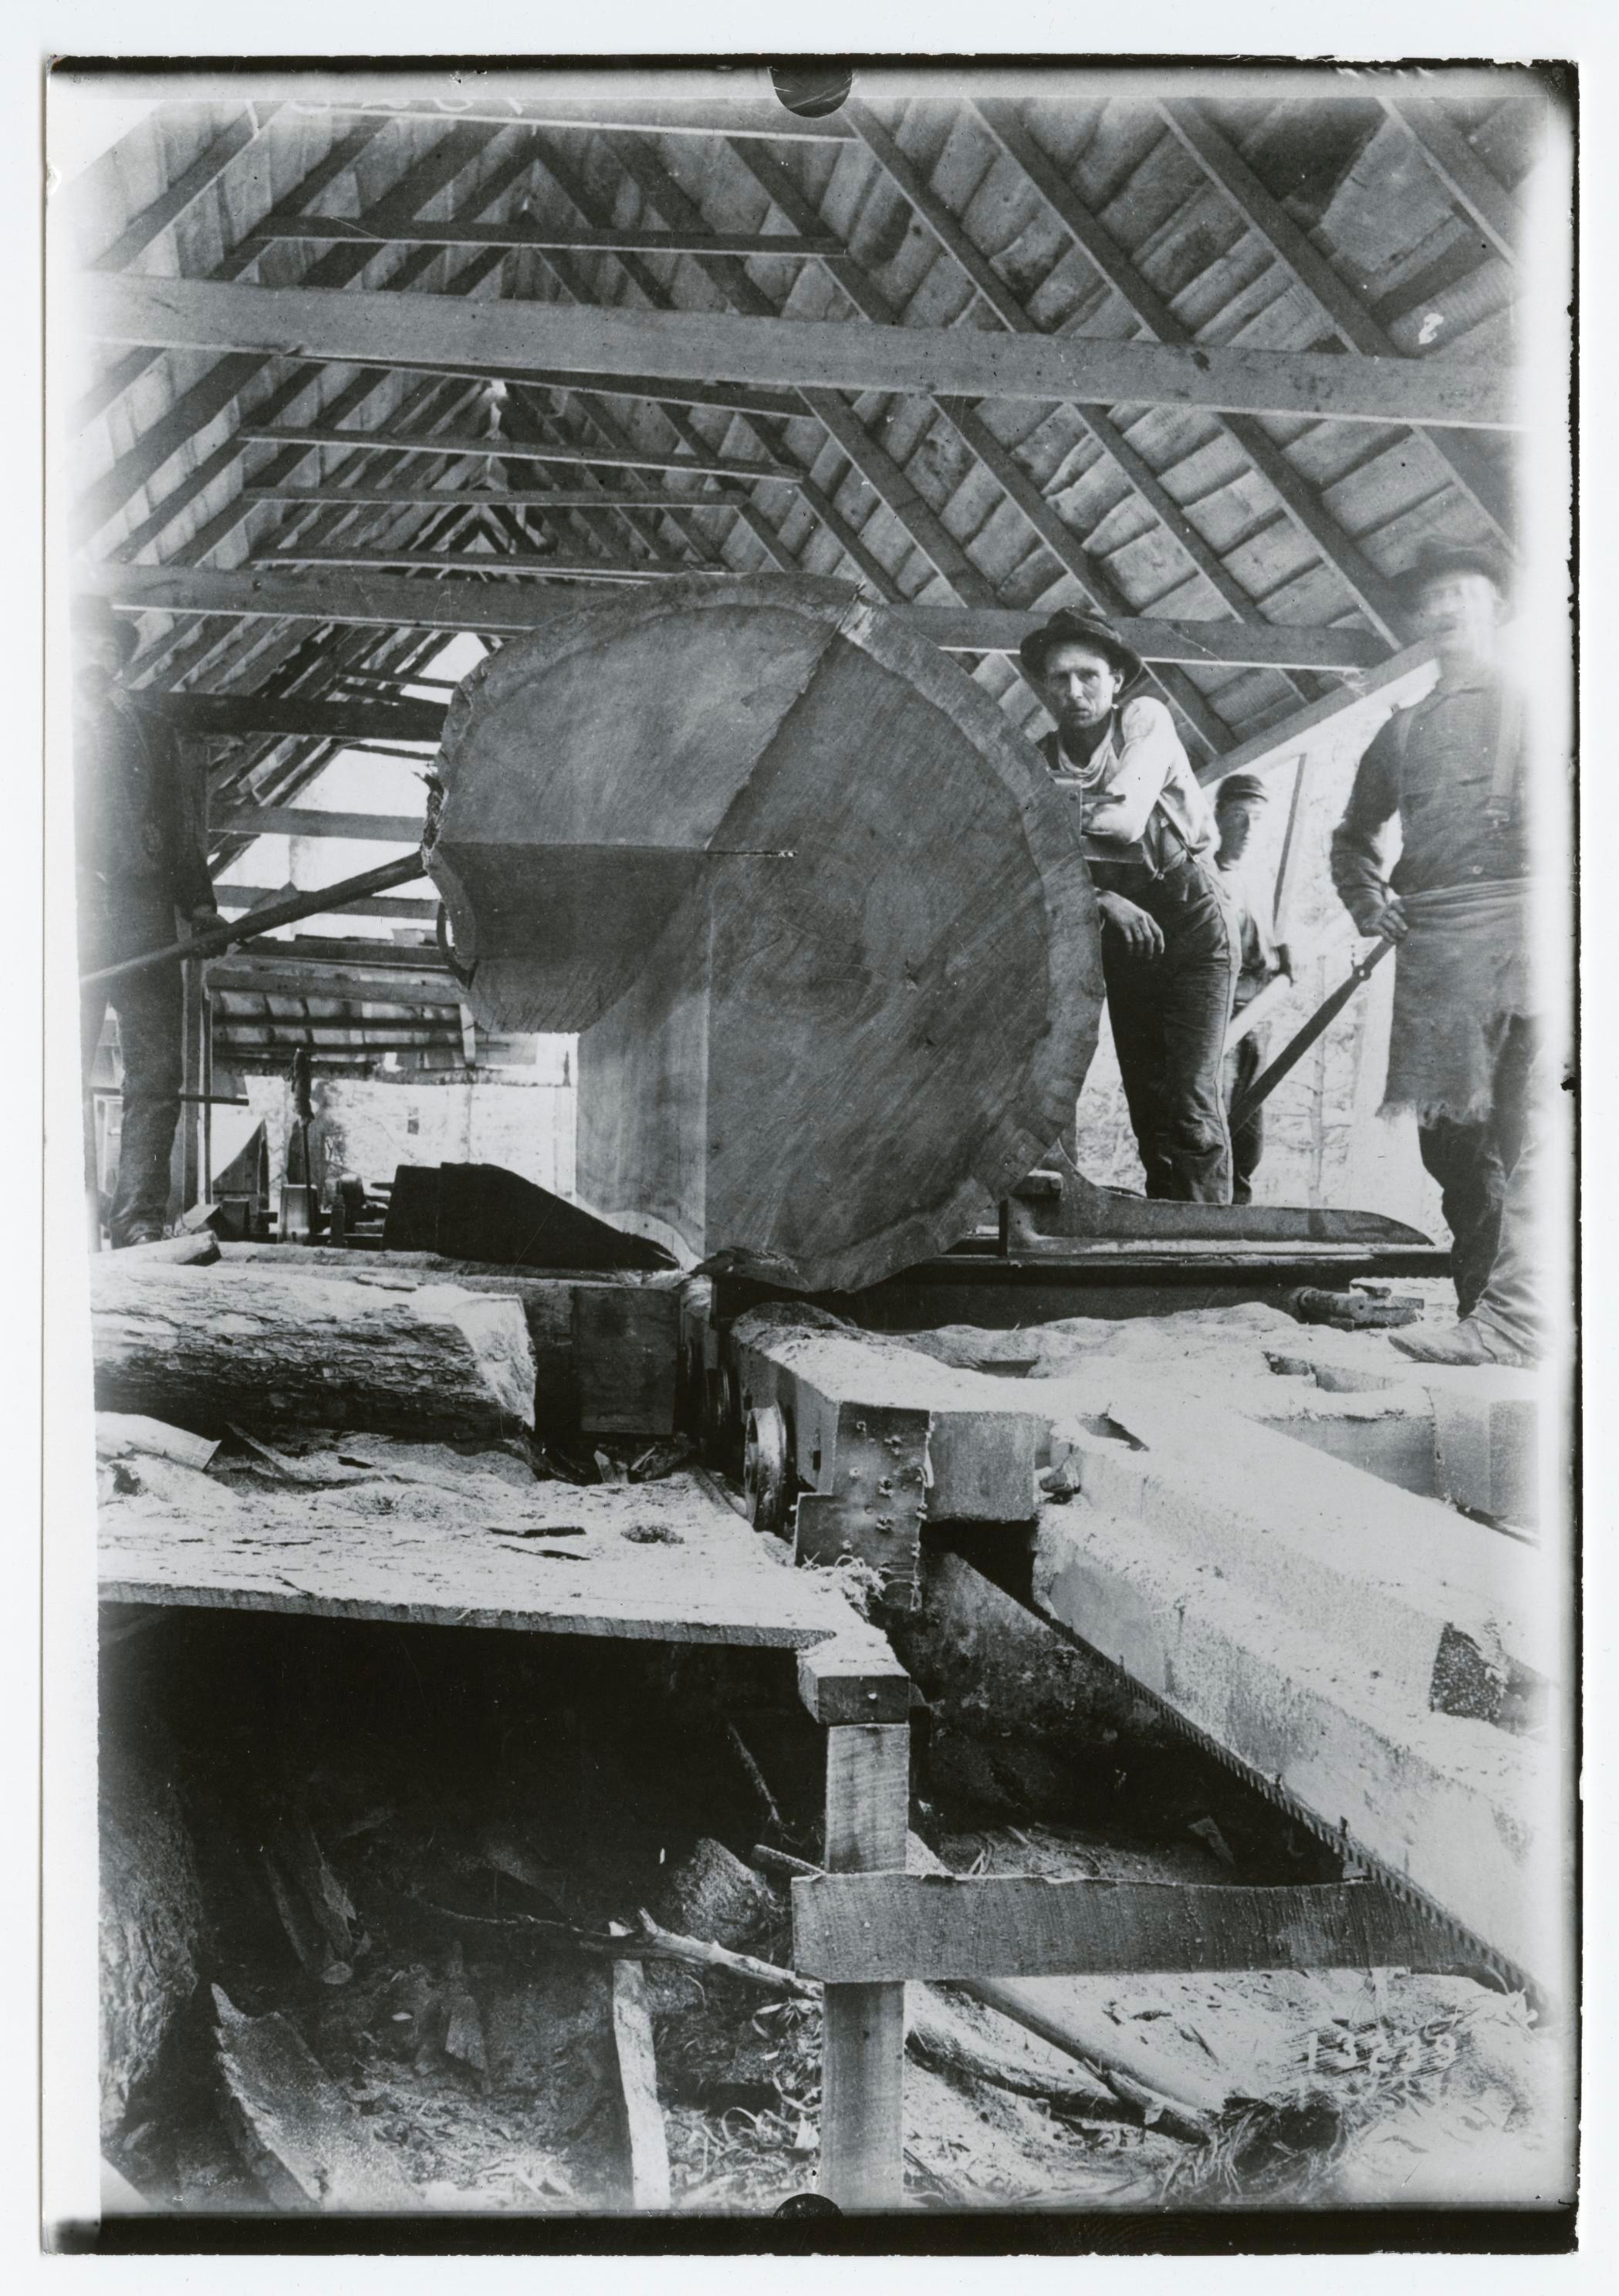 1900 2 men quarter sawing a large log